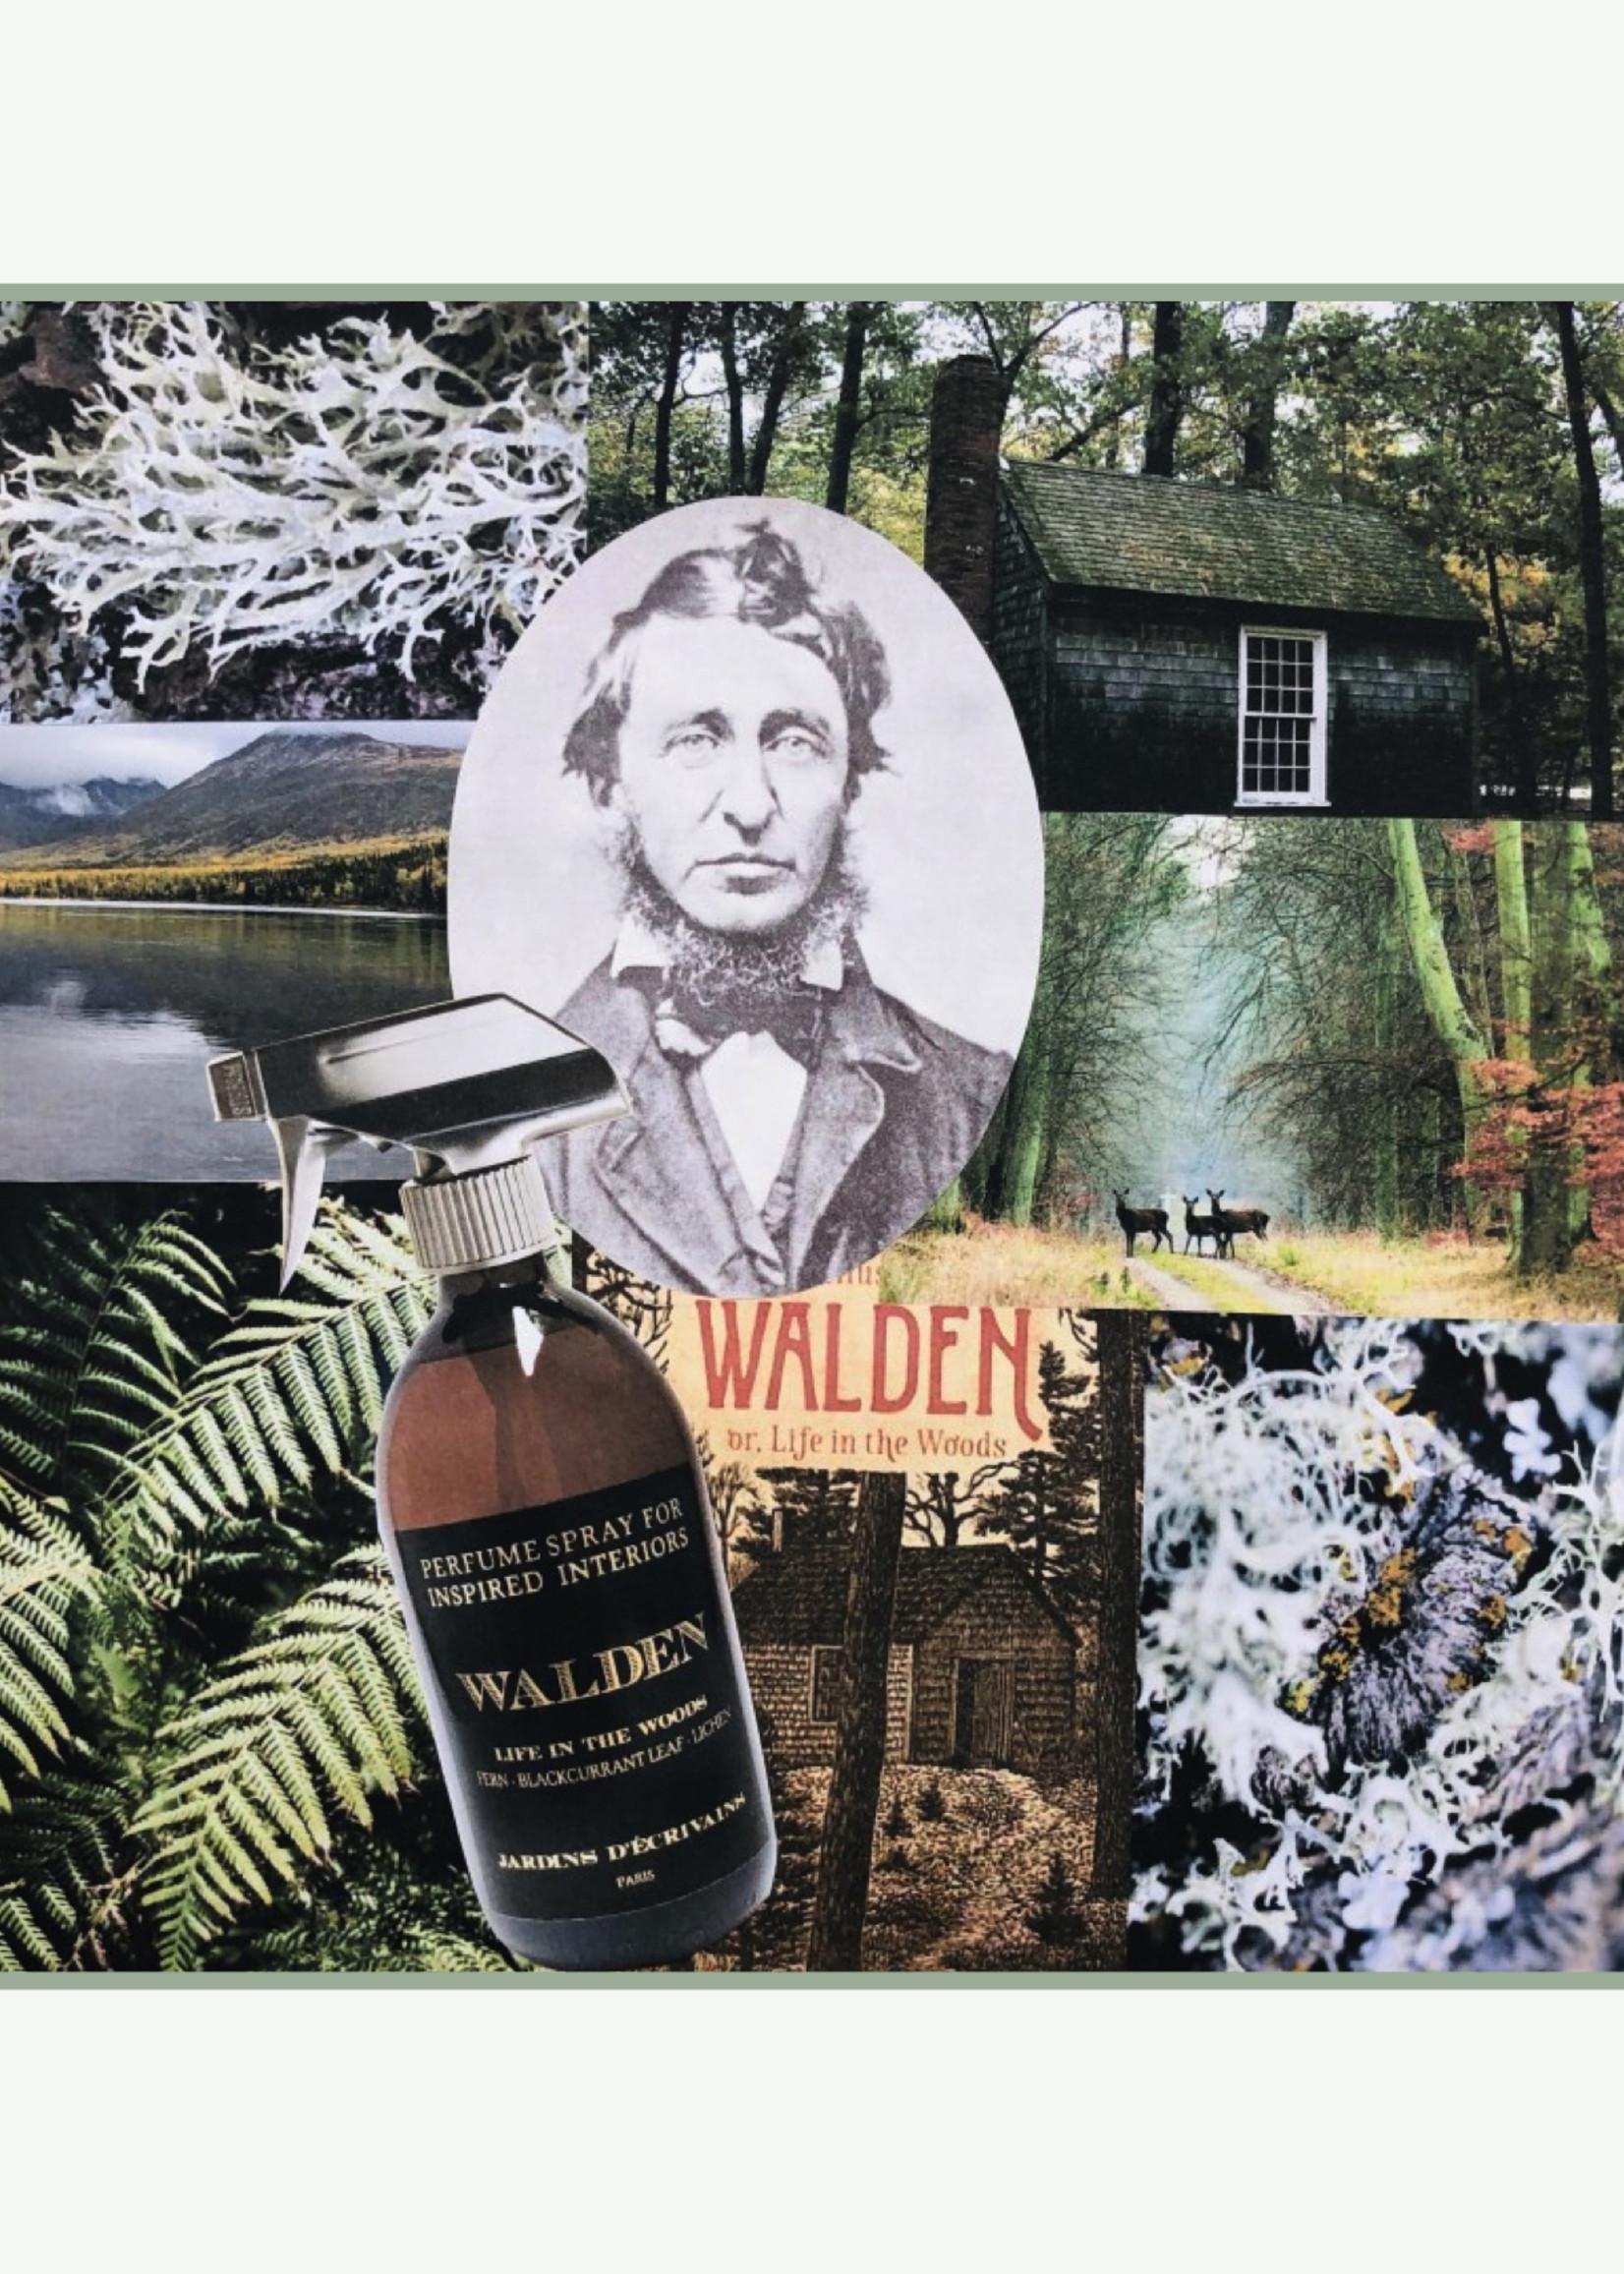 Jardins d'ecrivains Jardins d'écrivains - Walden - Interieurparfum